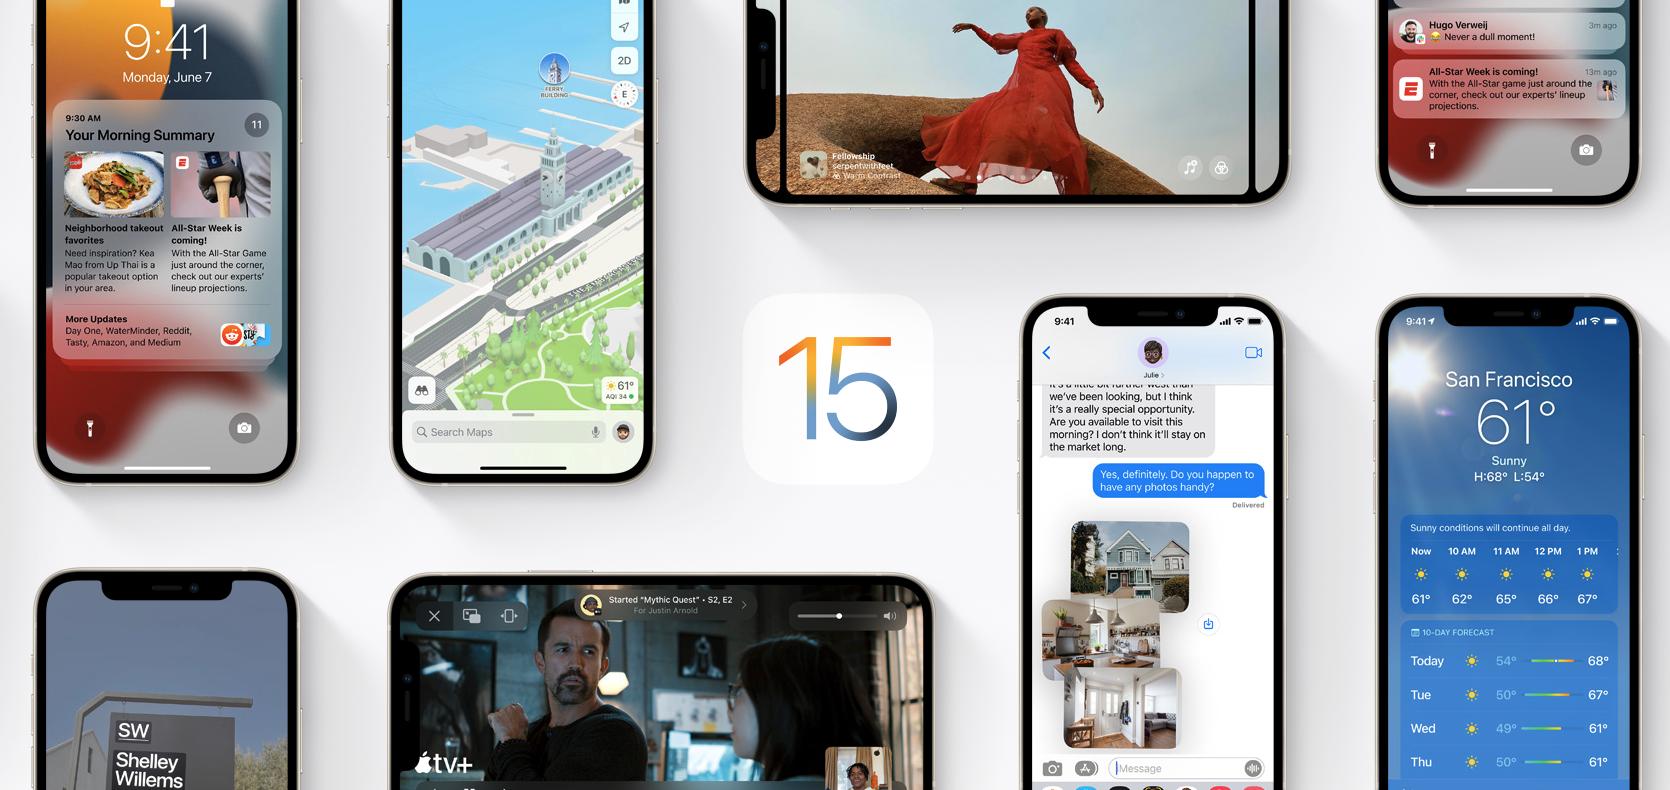 Apple Releases First Public Betas of iOS/iPadOS 15, watchOS 8, tvOS 15